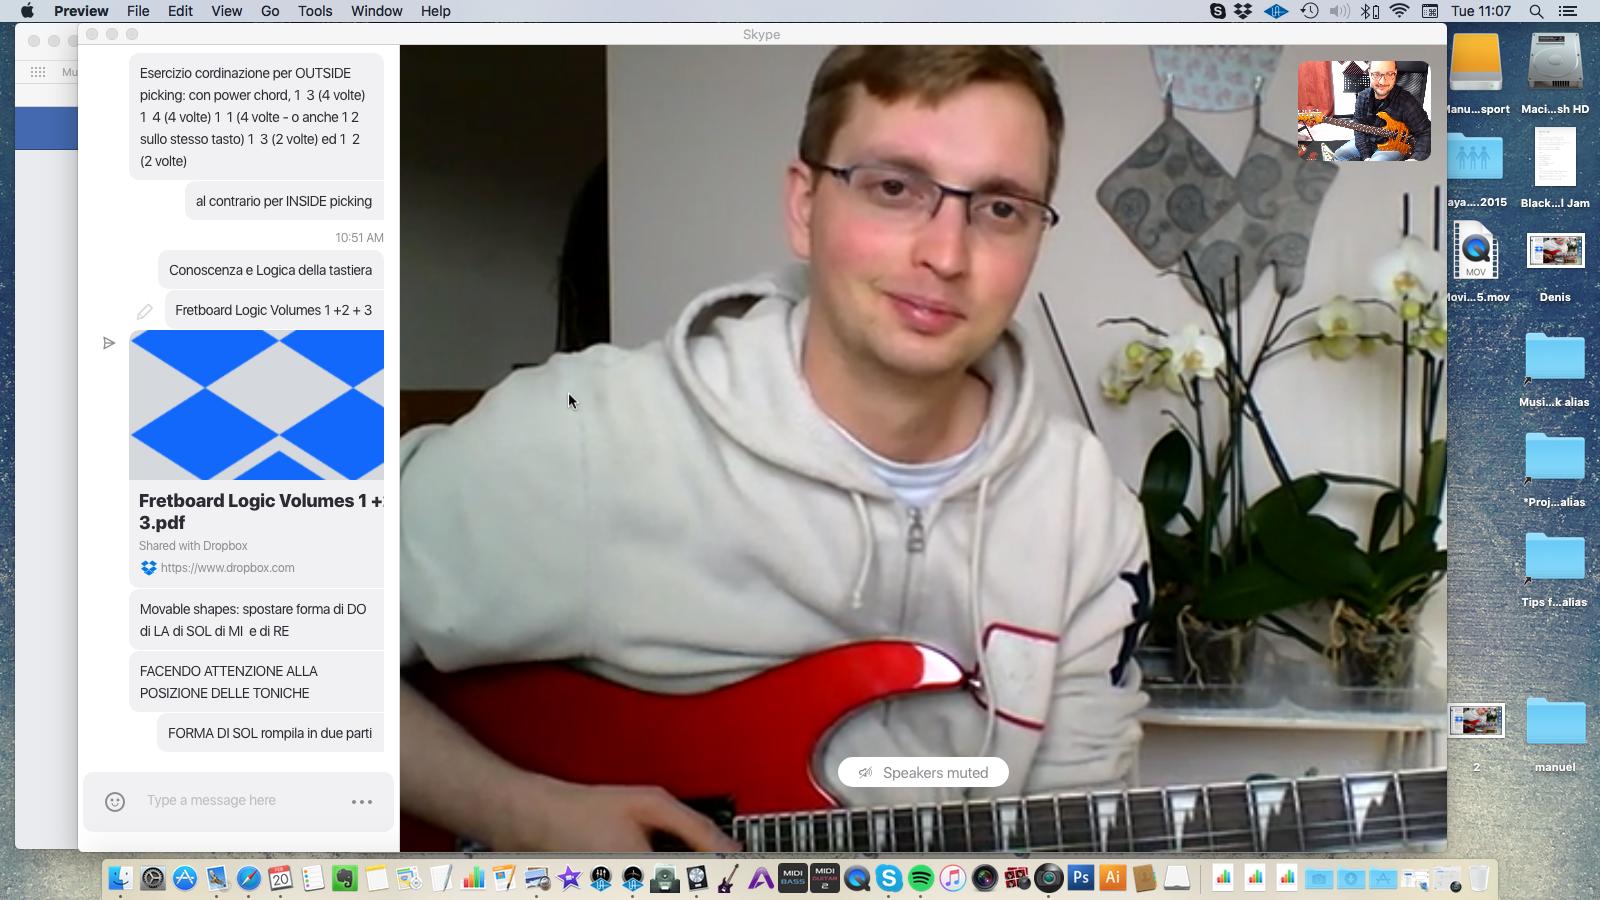 Denis Skype